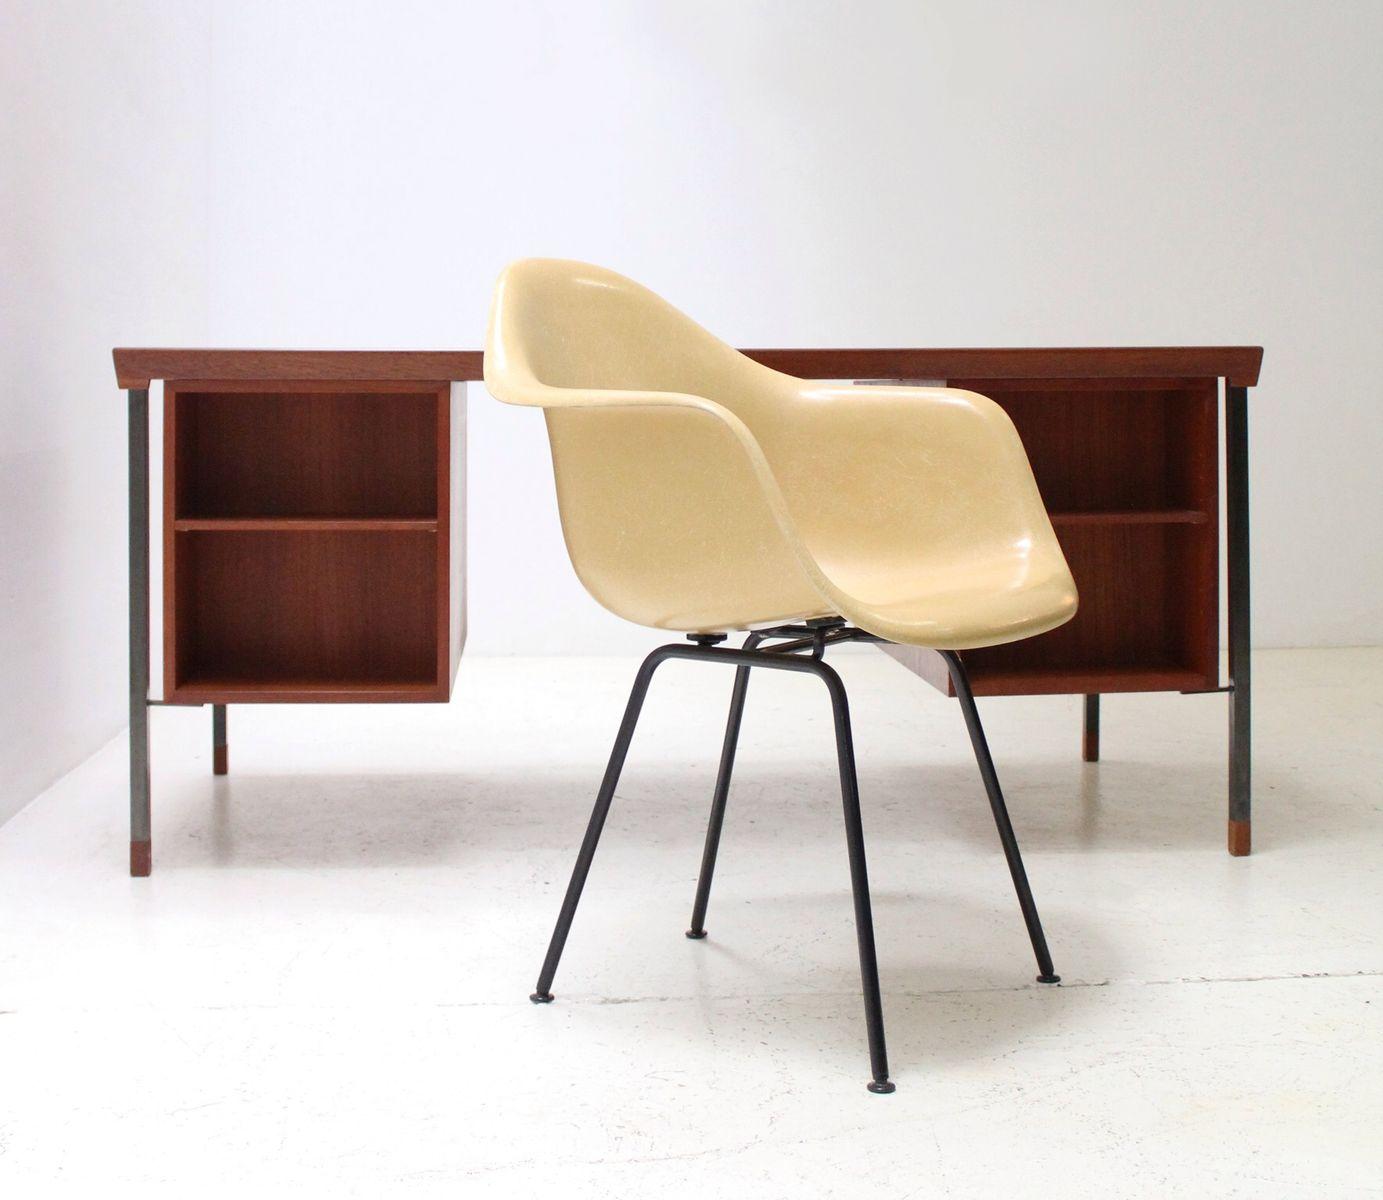 Mustard fiberglass armchair by charles ray eames for herman miller 196 - Herman miller france ...